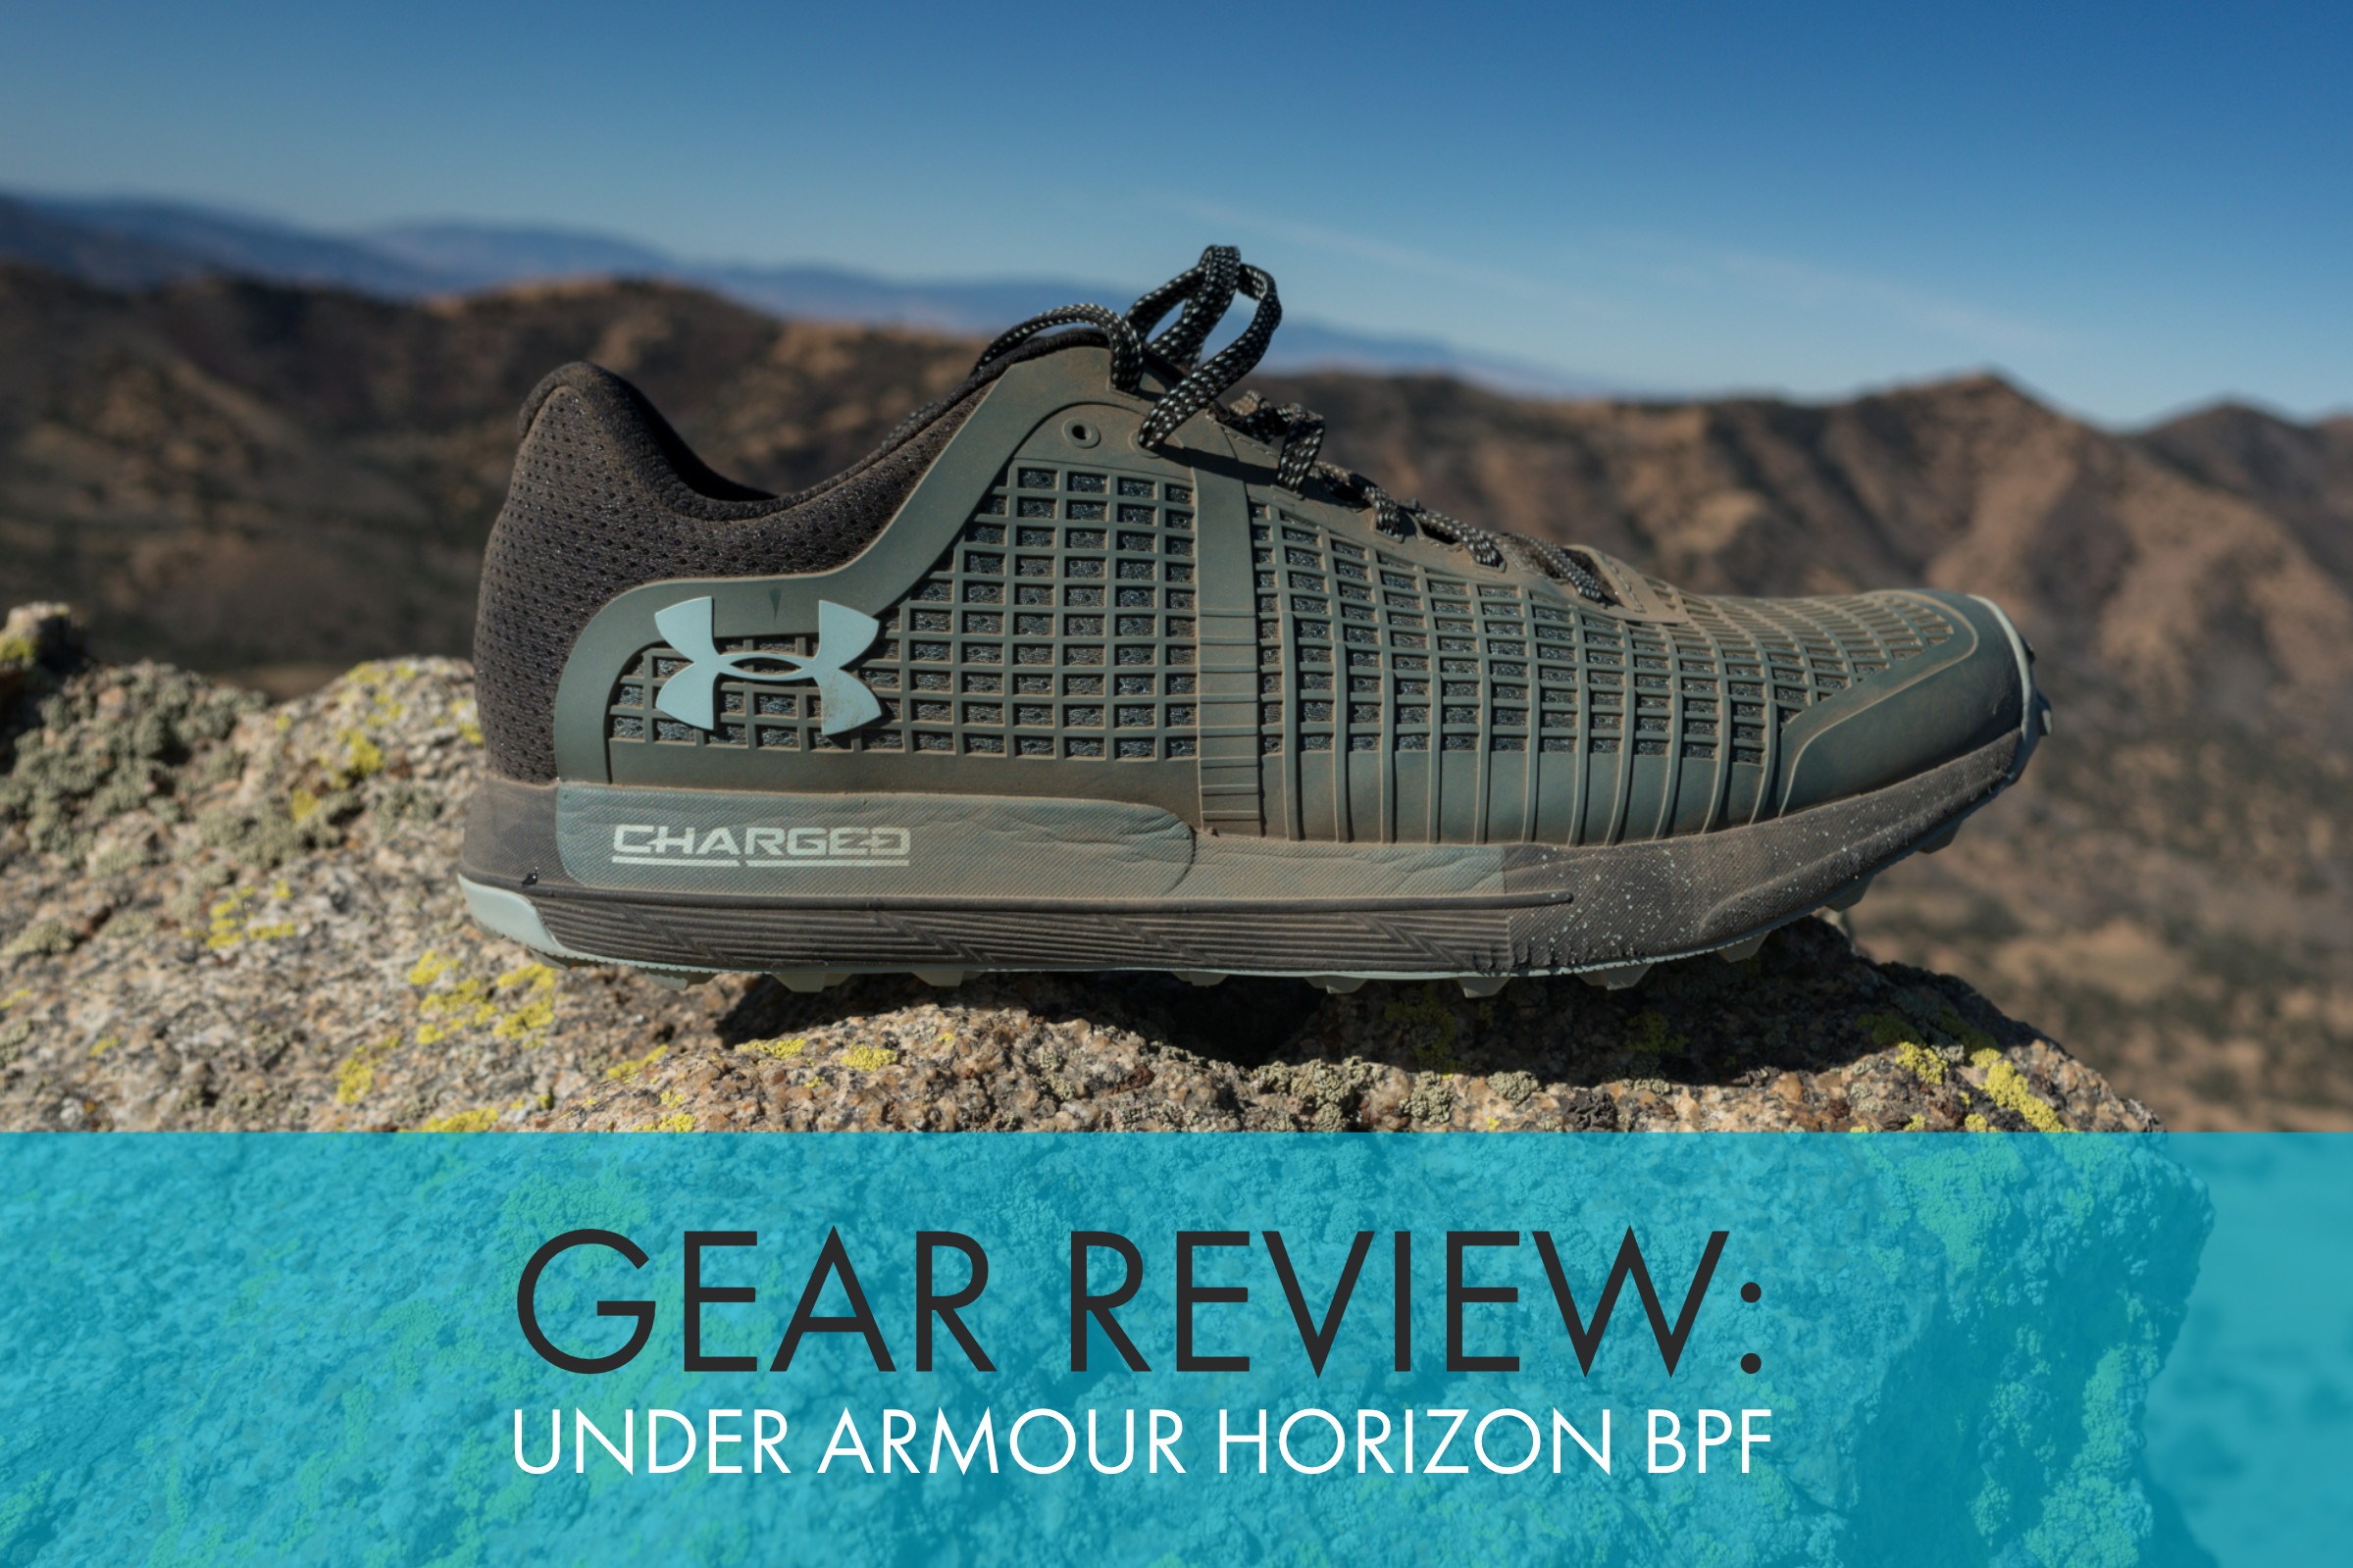 Under Armour Horizon BPF Trail Shoe